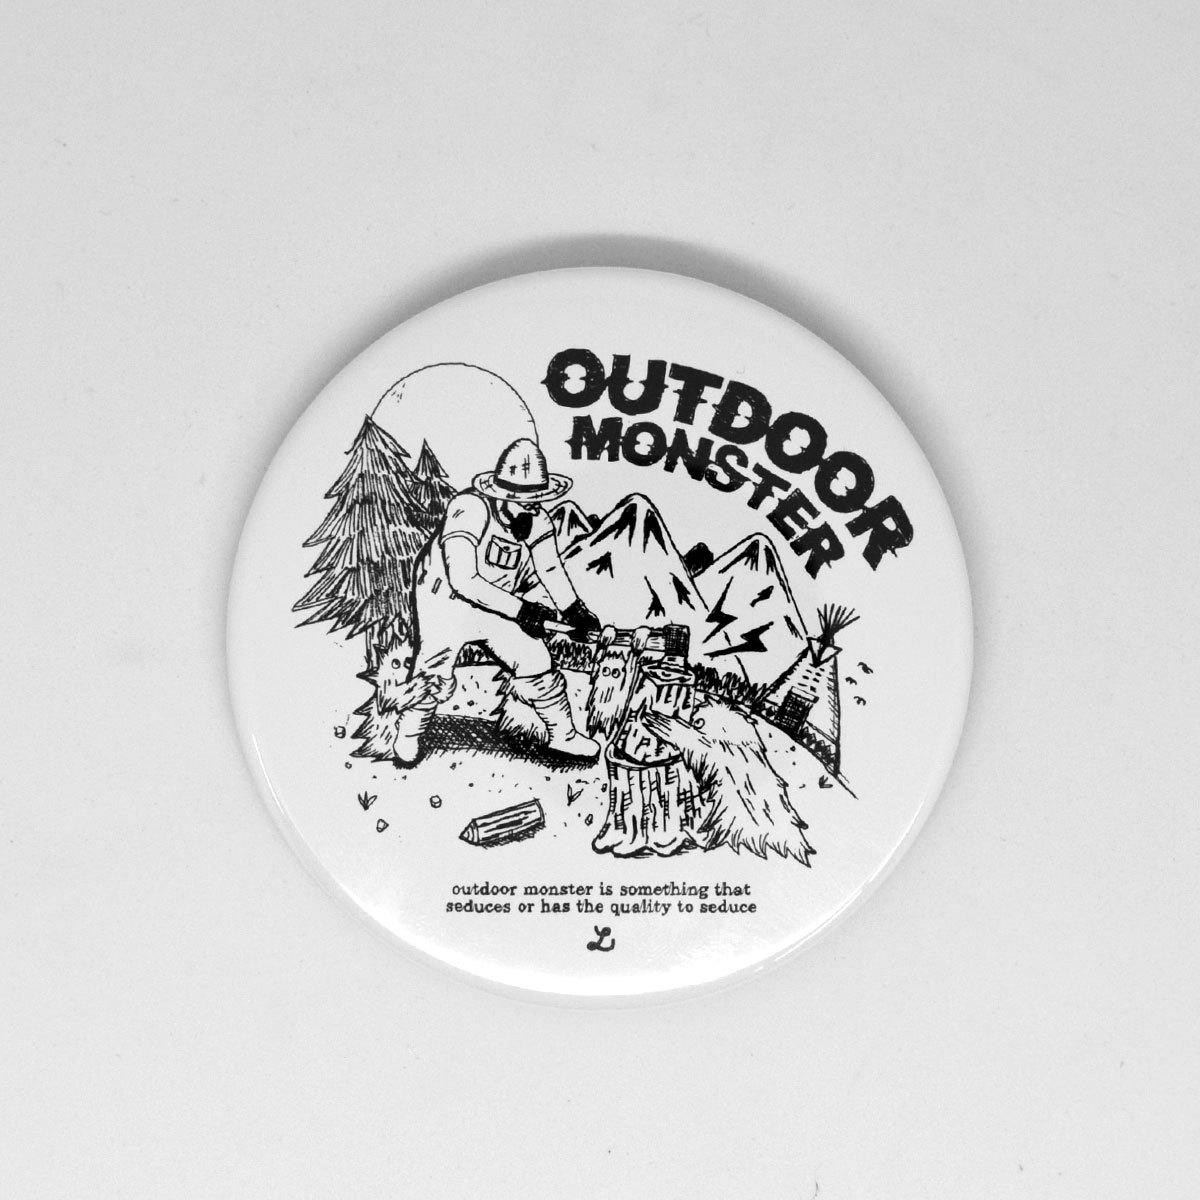 OUTDOOR MONSTER(アウトドアモンスター) 缶バッジ